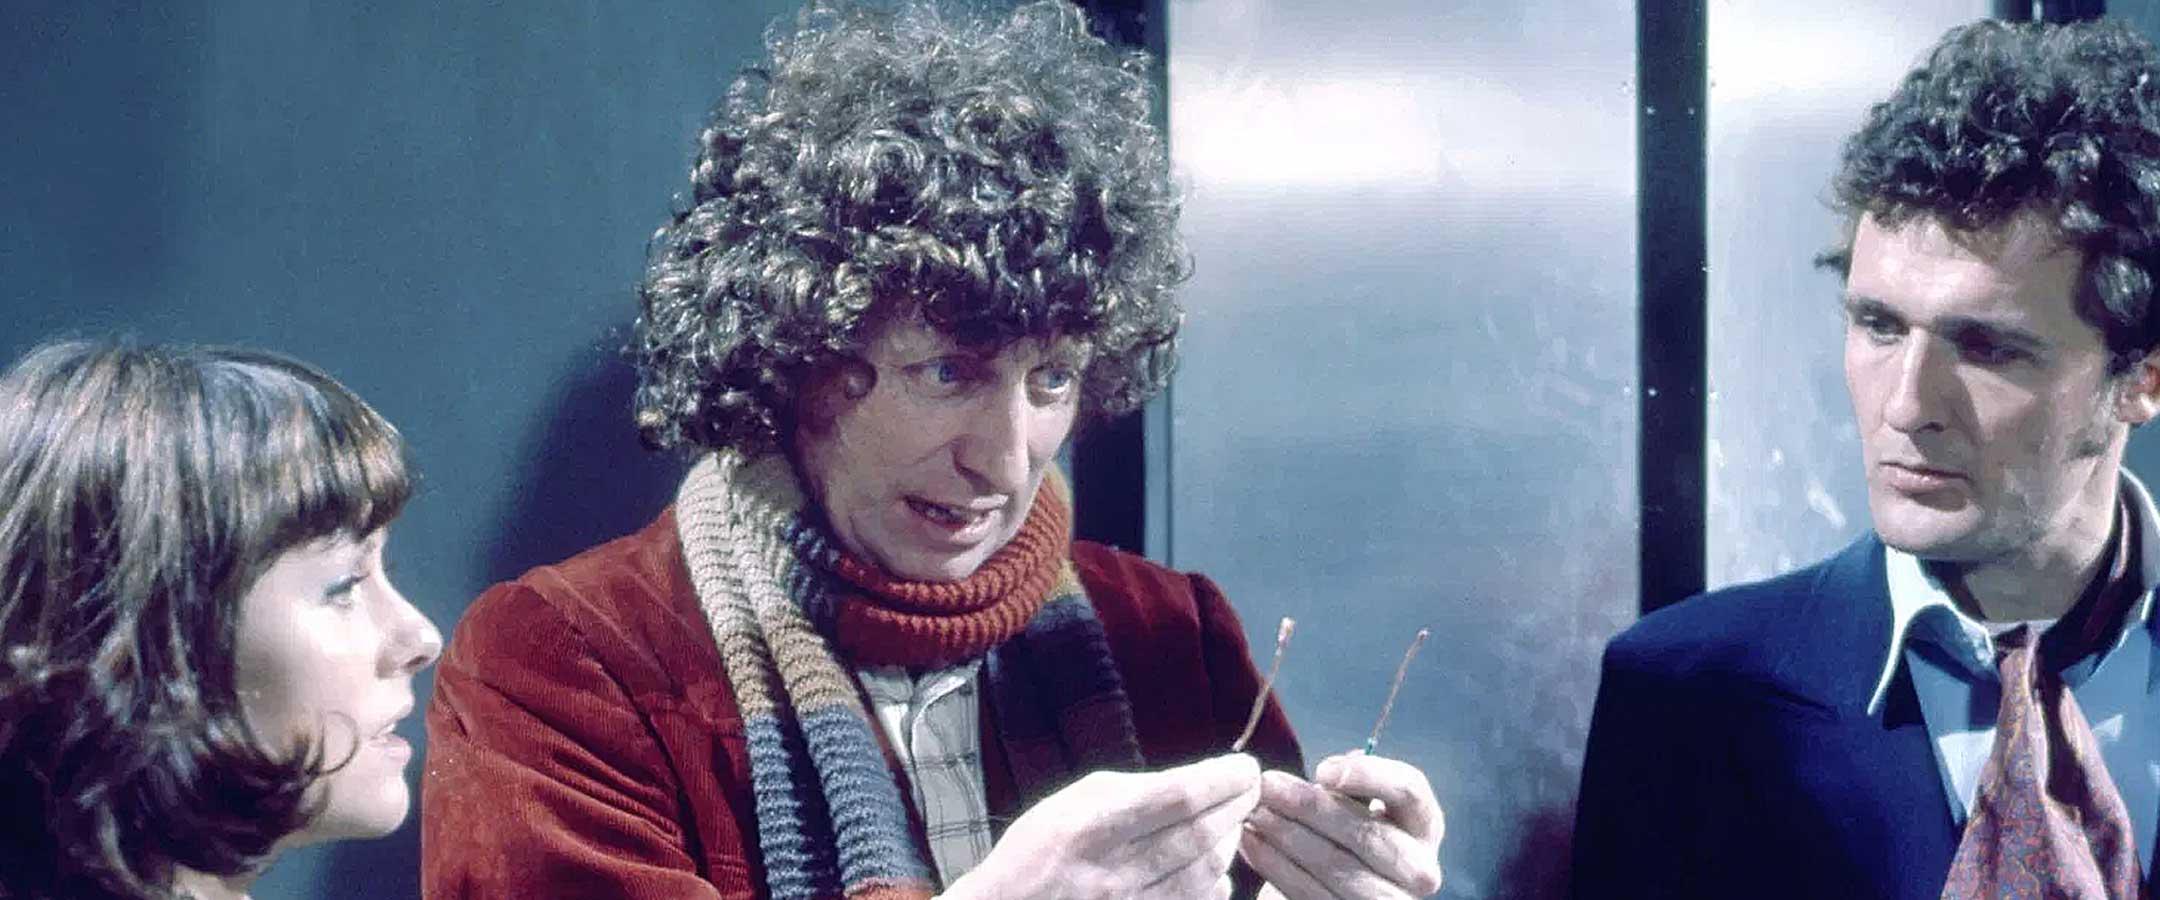 Ep217 - Genesis of the Daleks